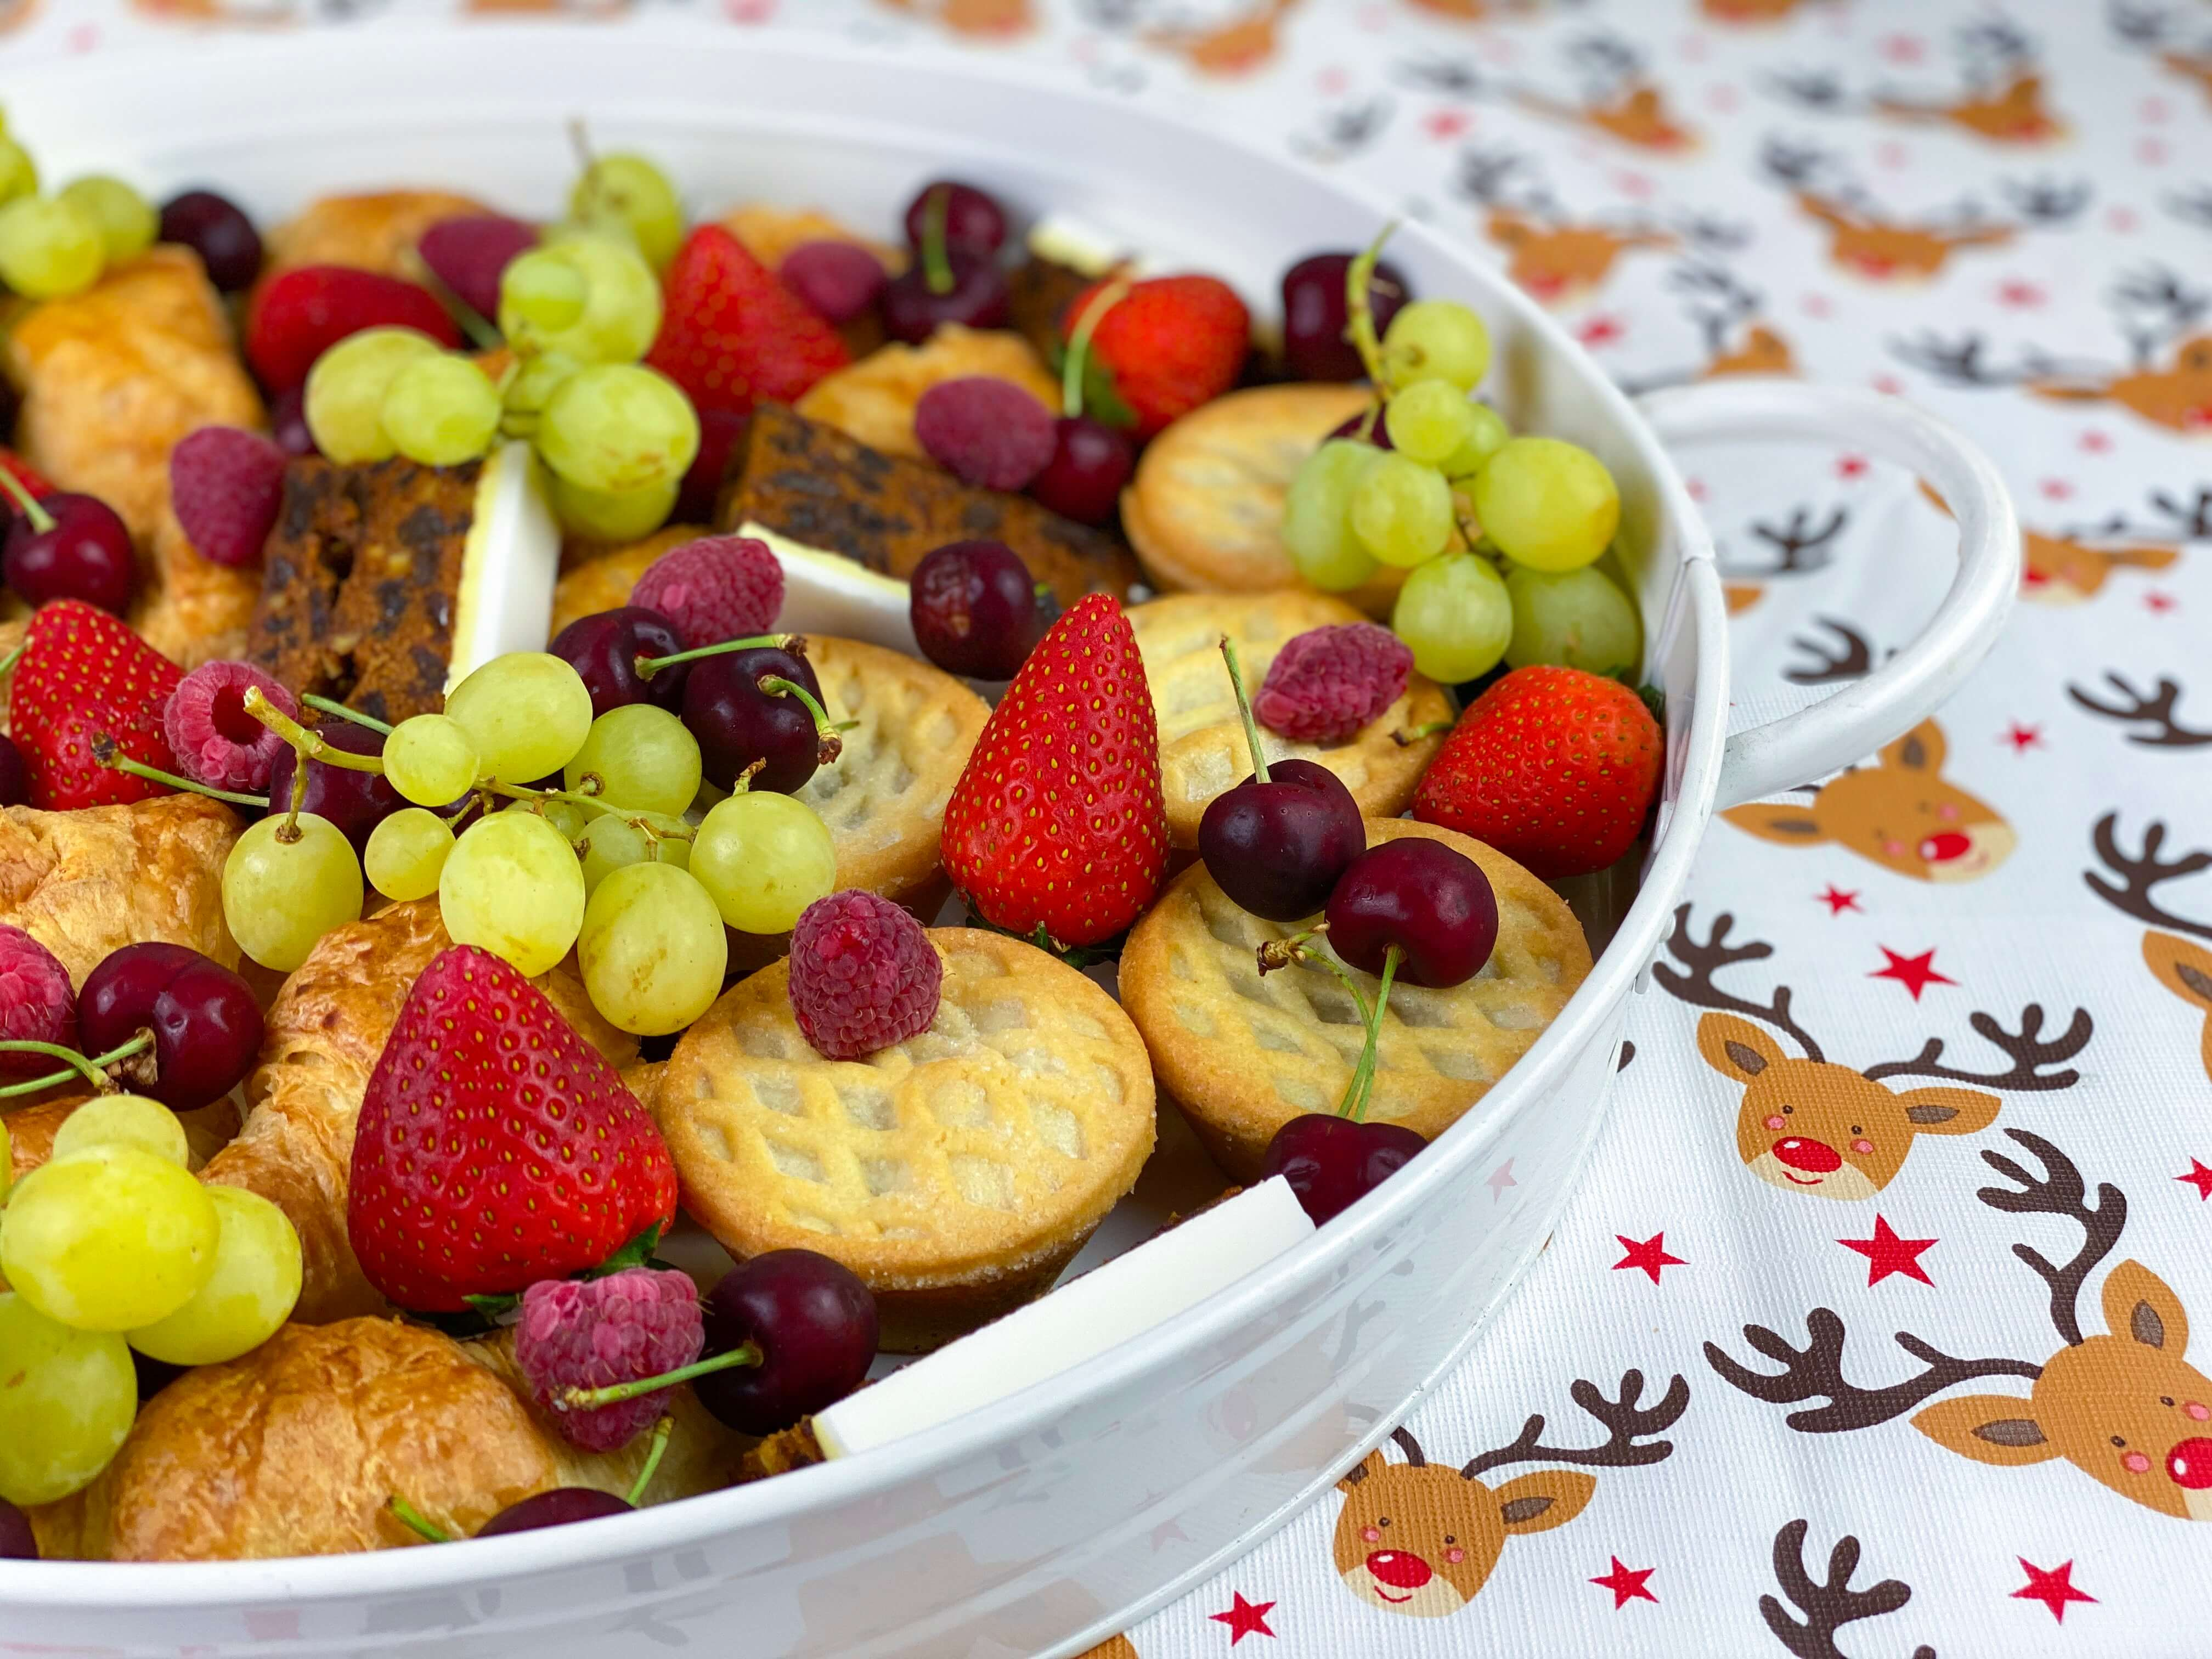 Christmas breakfast ideas - breakfast platter